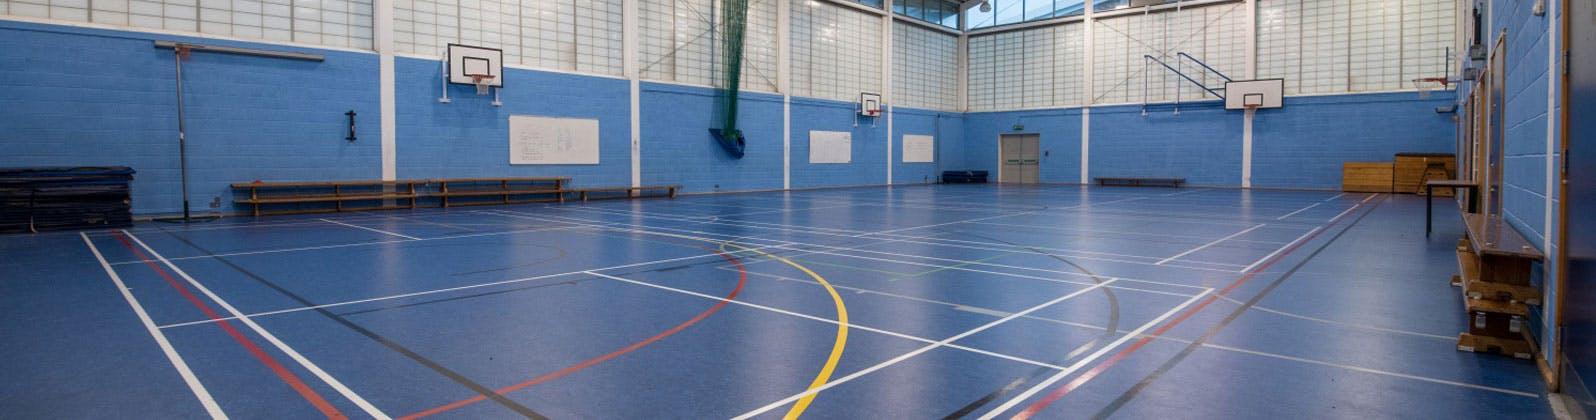 Ark Burlington Danes Academy Sports Hall